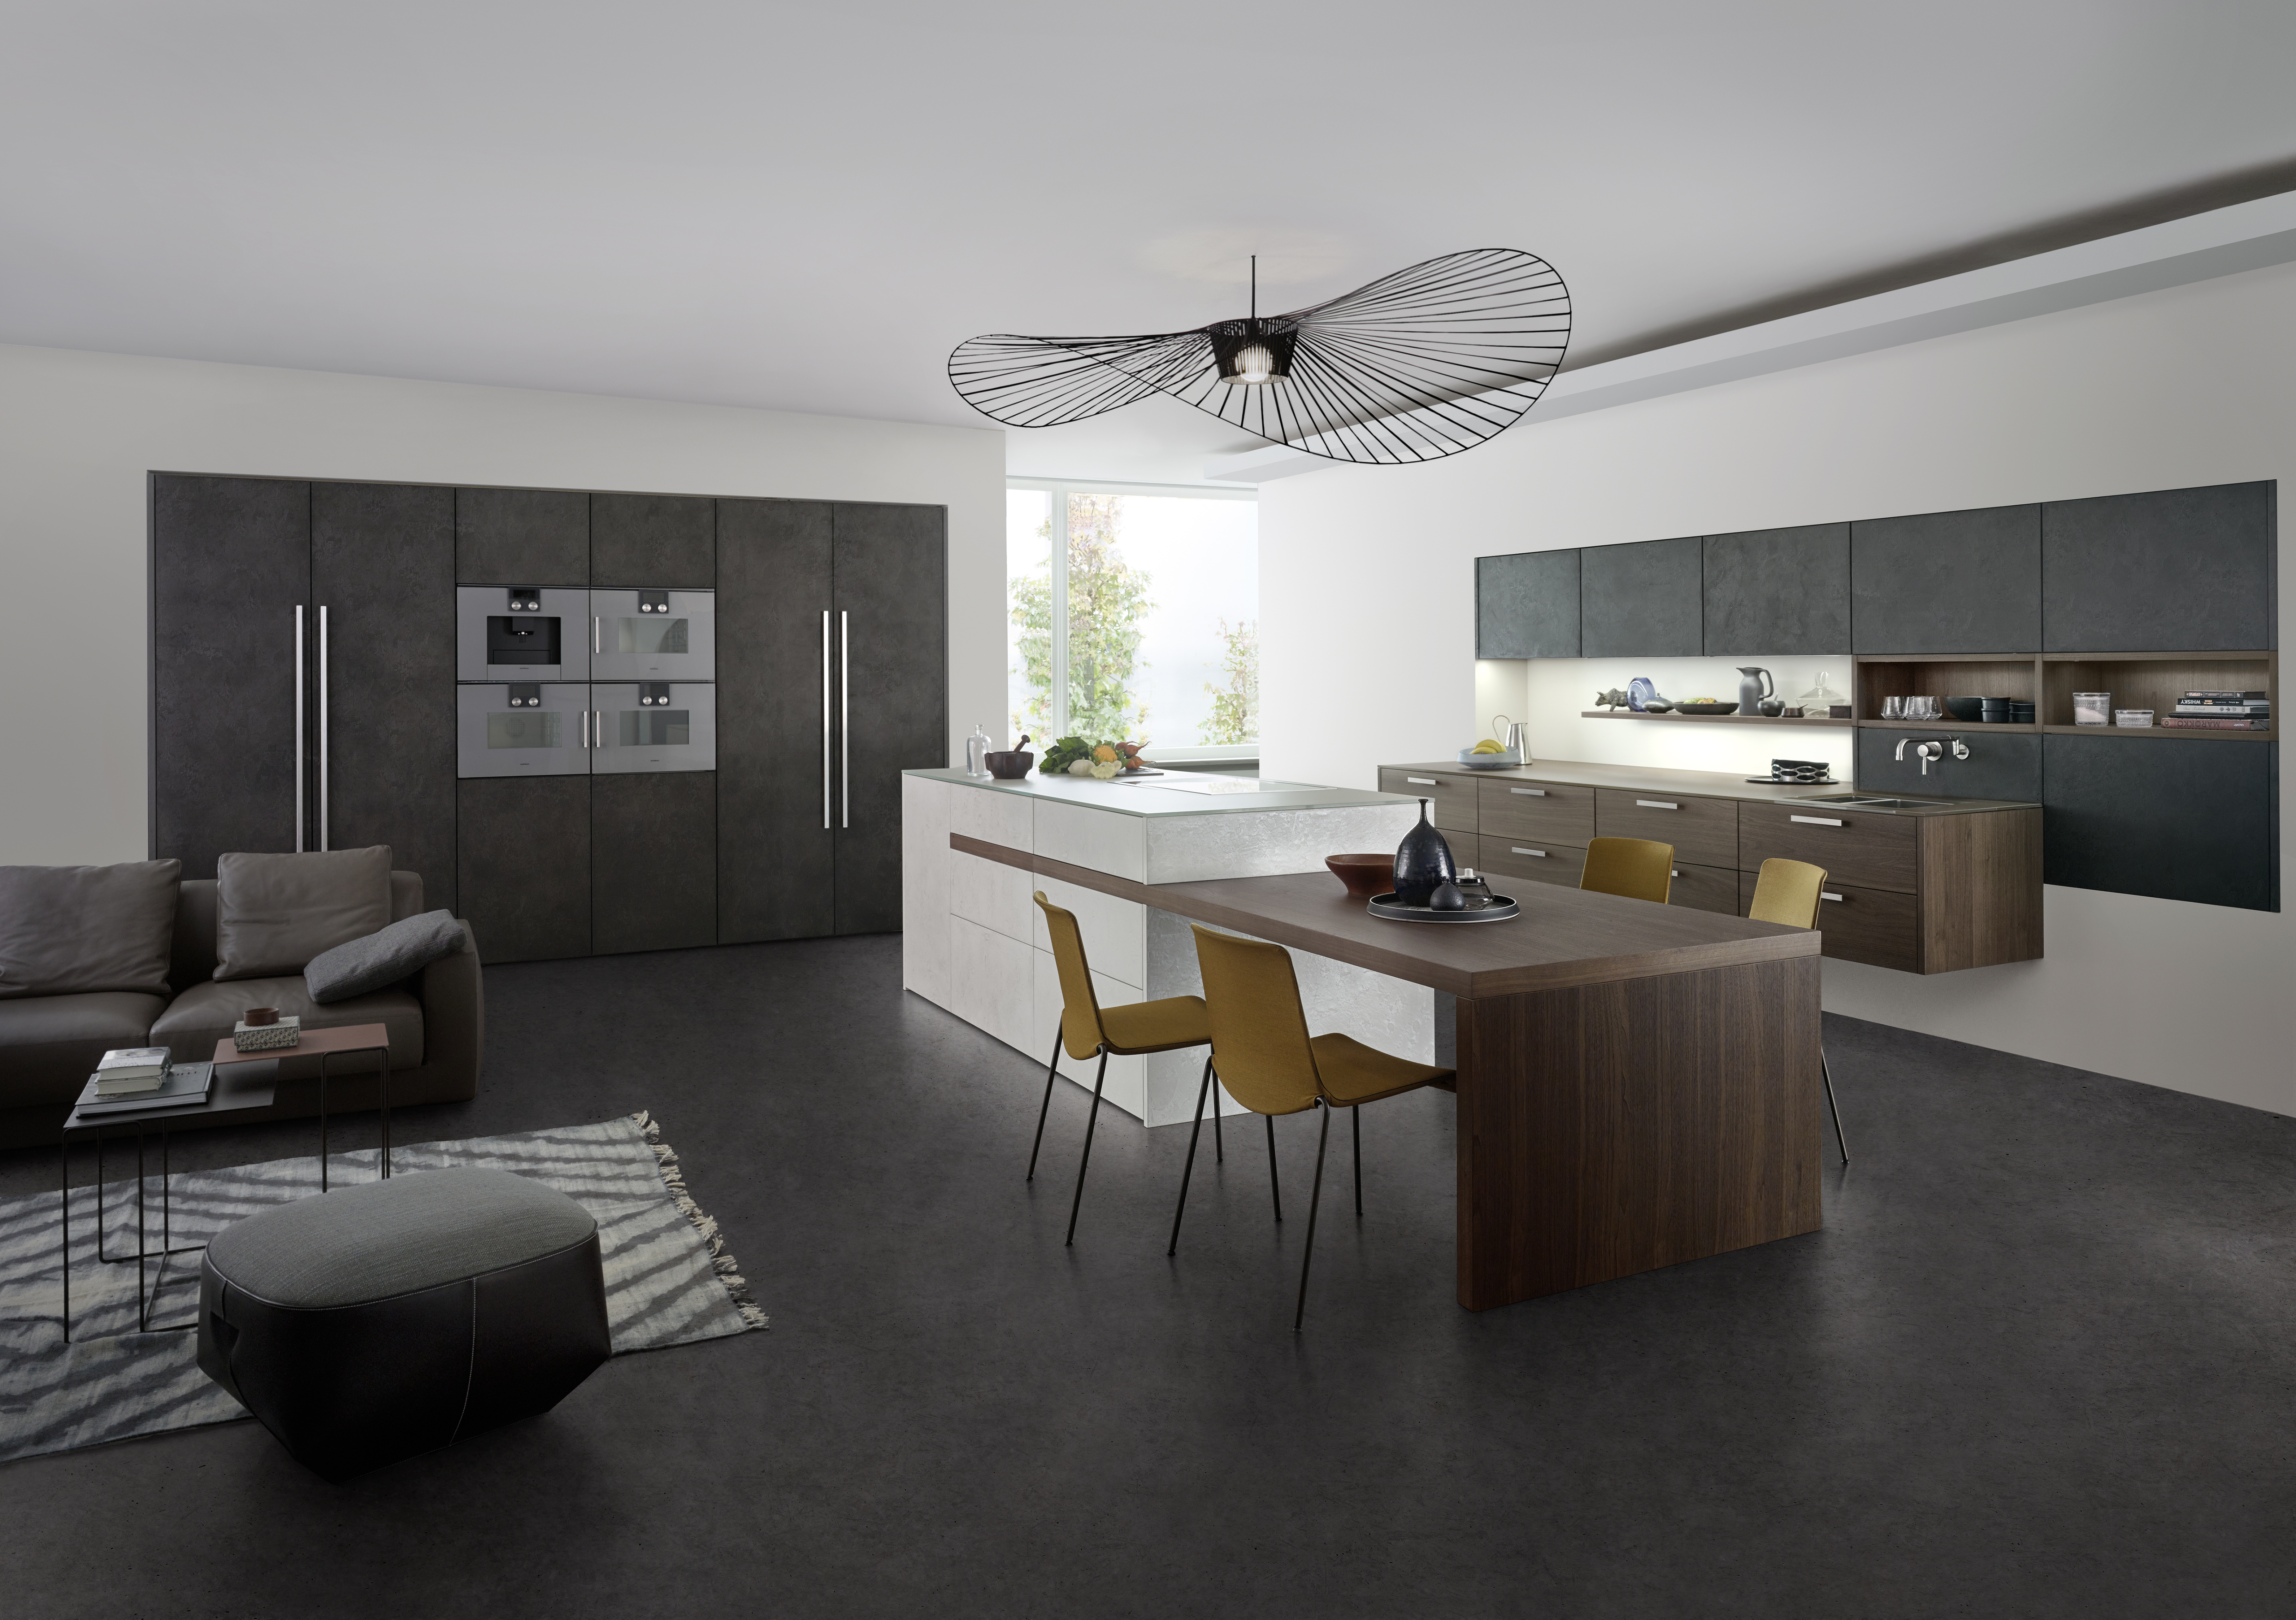 Betonküche: Wie das graue Material die Küche erobert